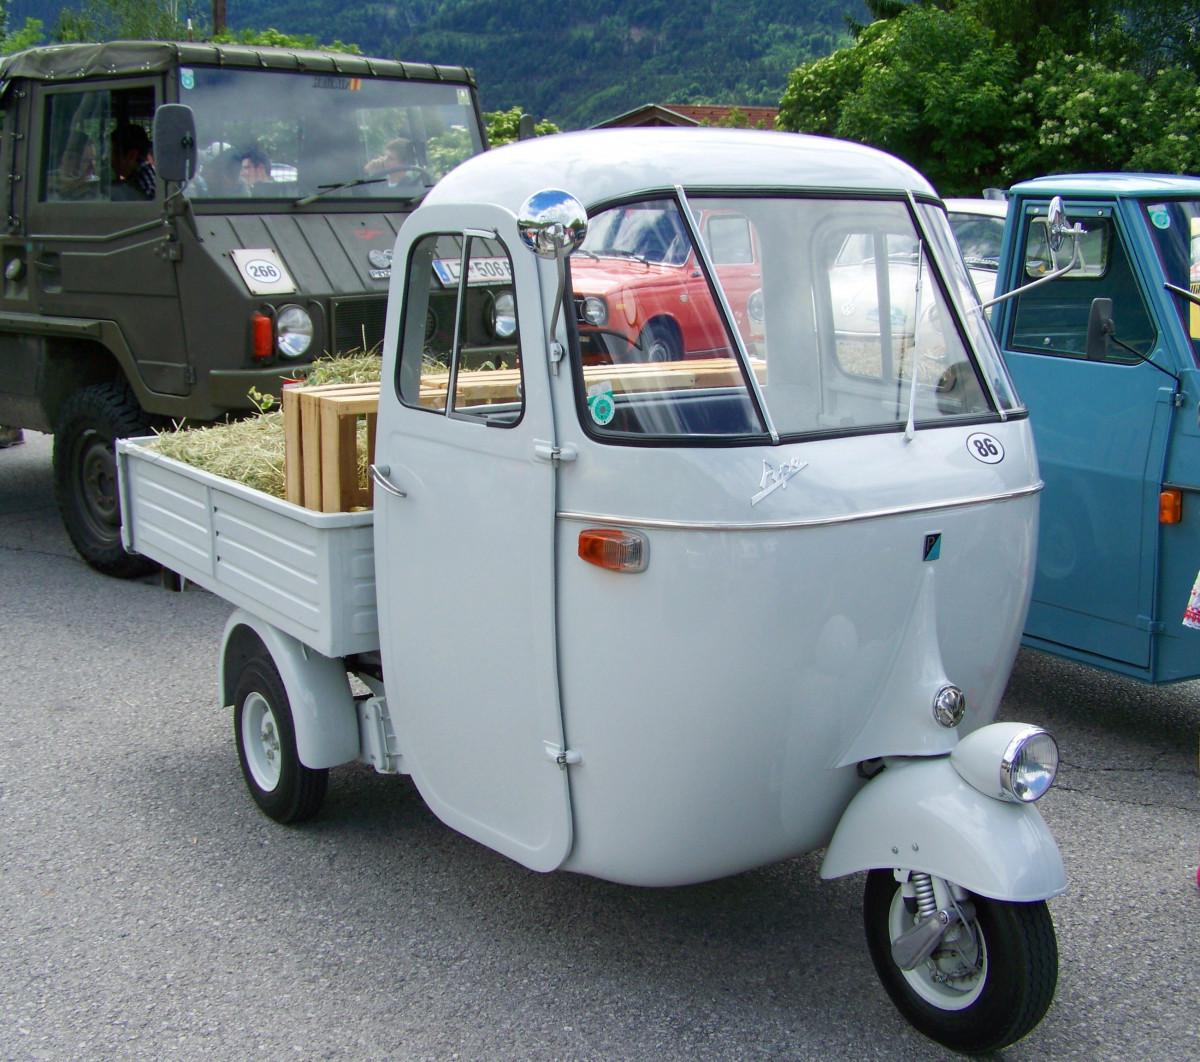 images gratuites blanc voiture chariot tricycle van un camion v hicule v t ran voiture. Black Bedroom Furniture Sets. Home Design Ideas